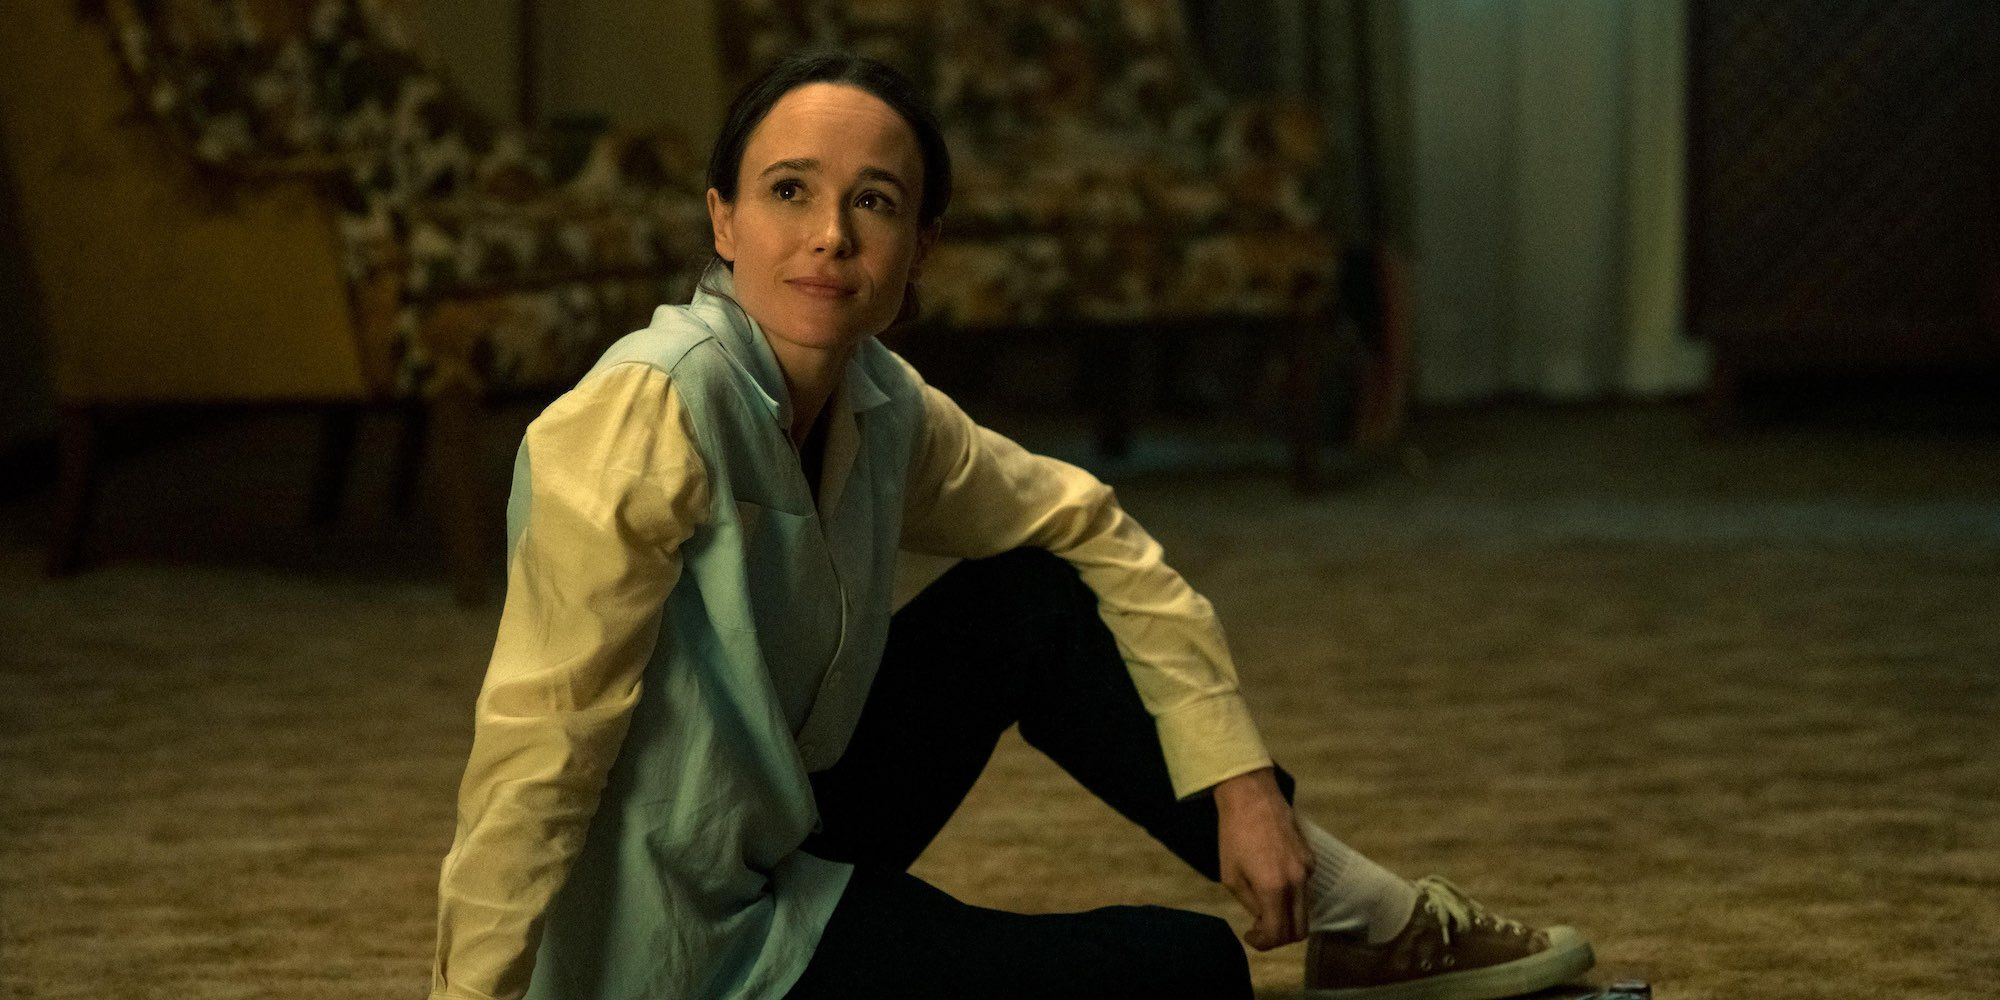 Elliot Page as Vanya in The Umbrella Academy Season 2